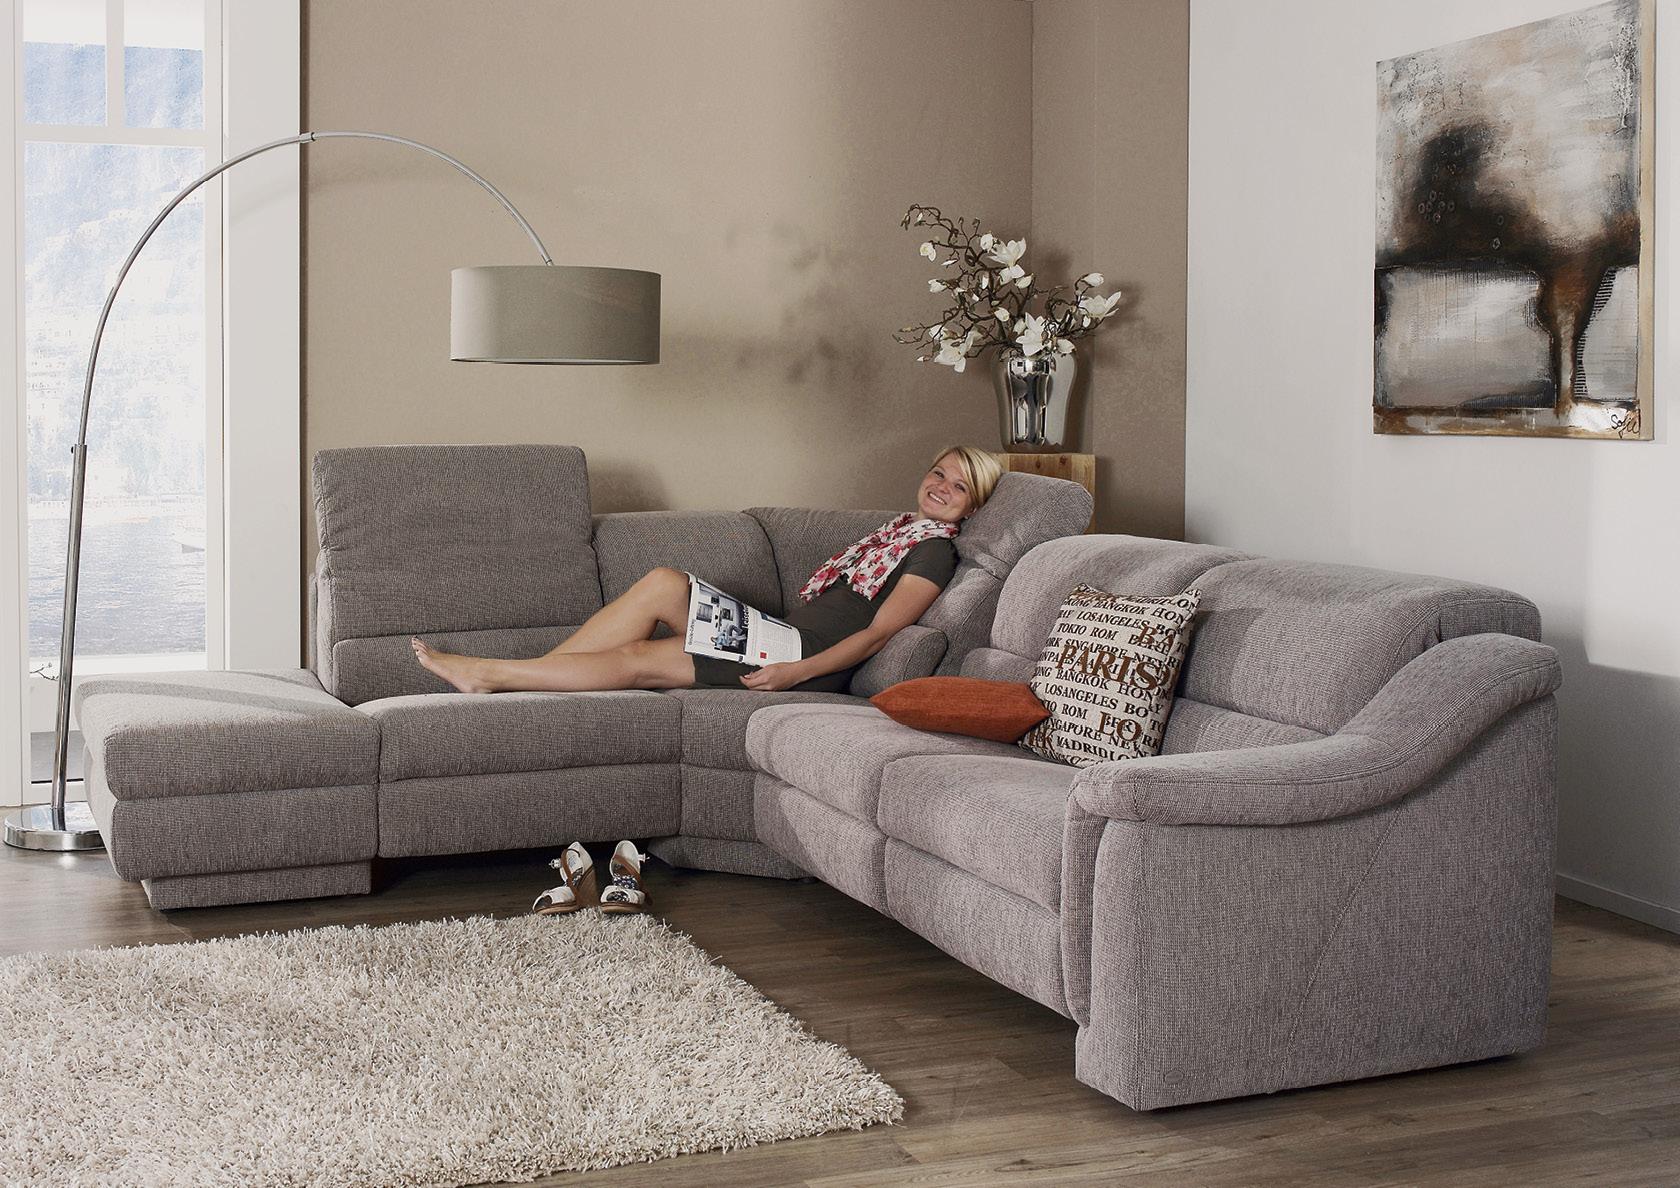 Sofas & Garnituren - Röger Möbel Inh. Bernd Röger in Herbrechtingen